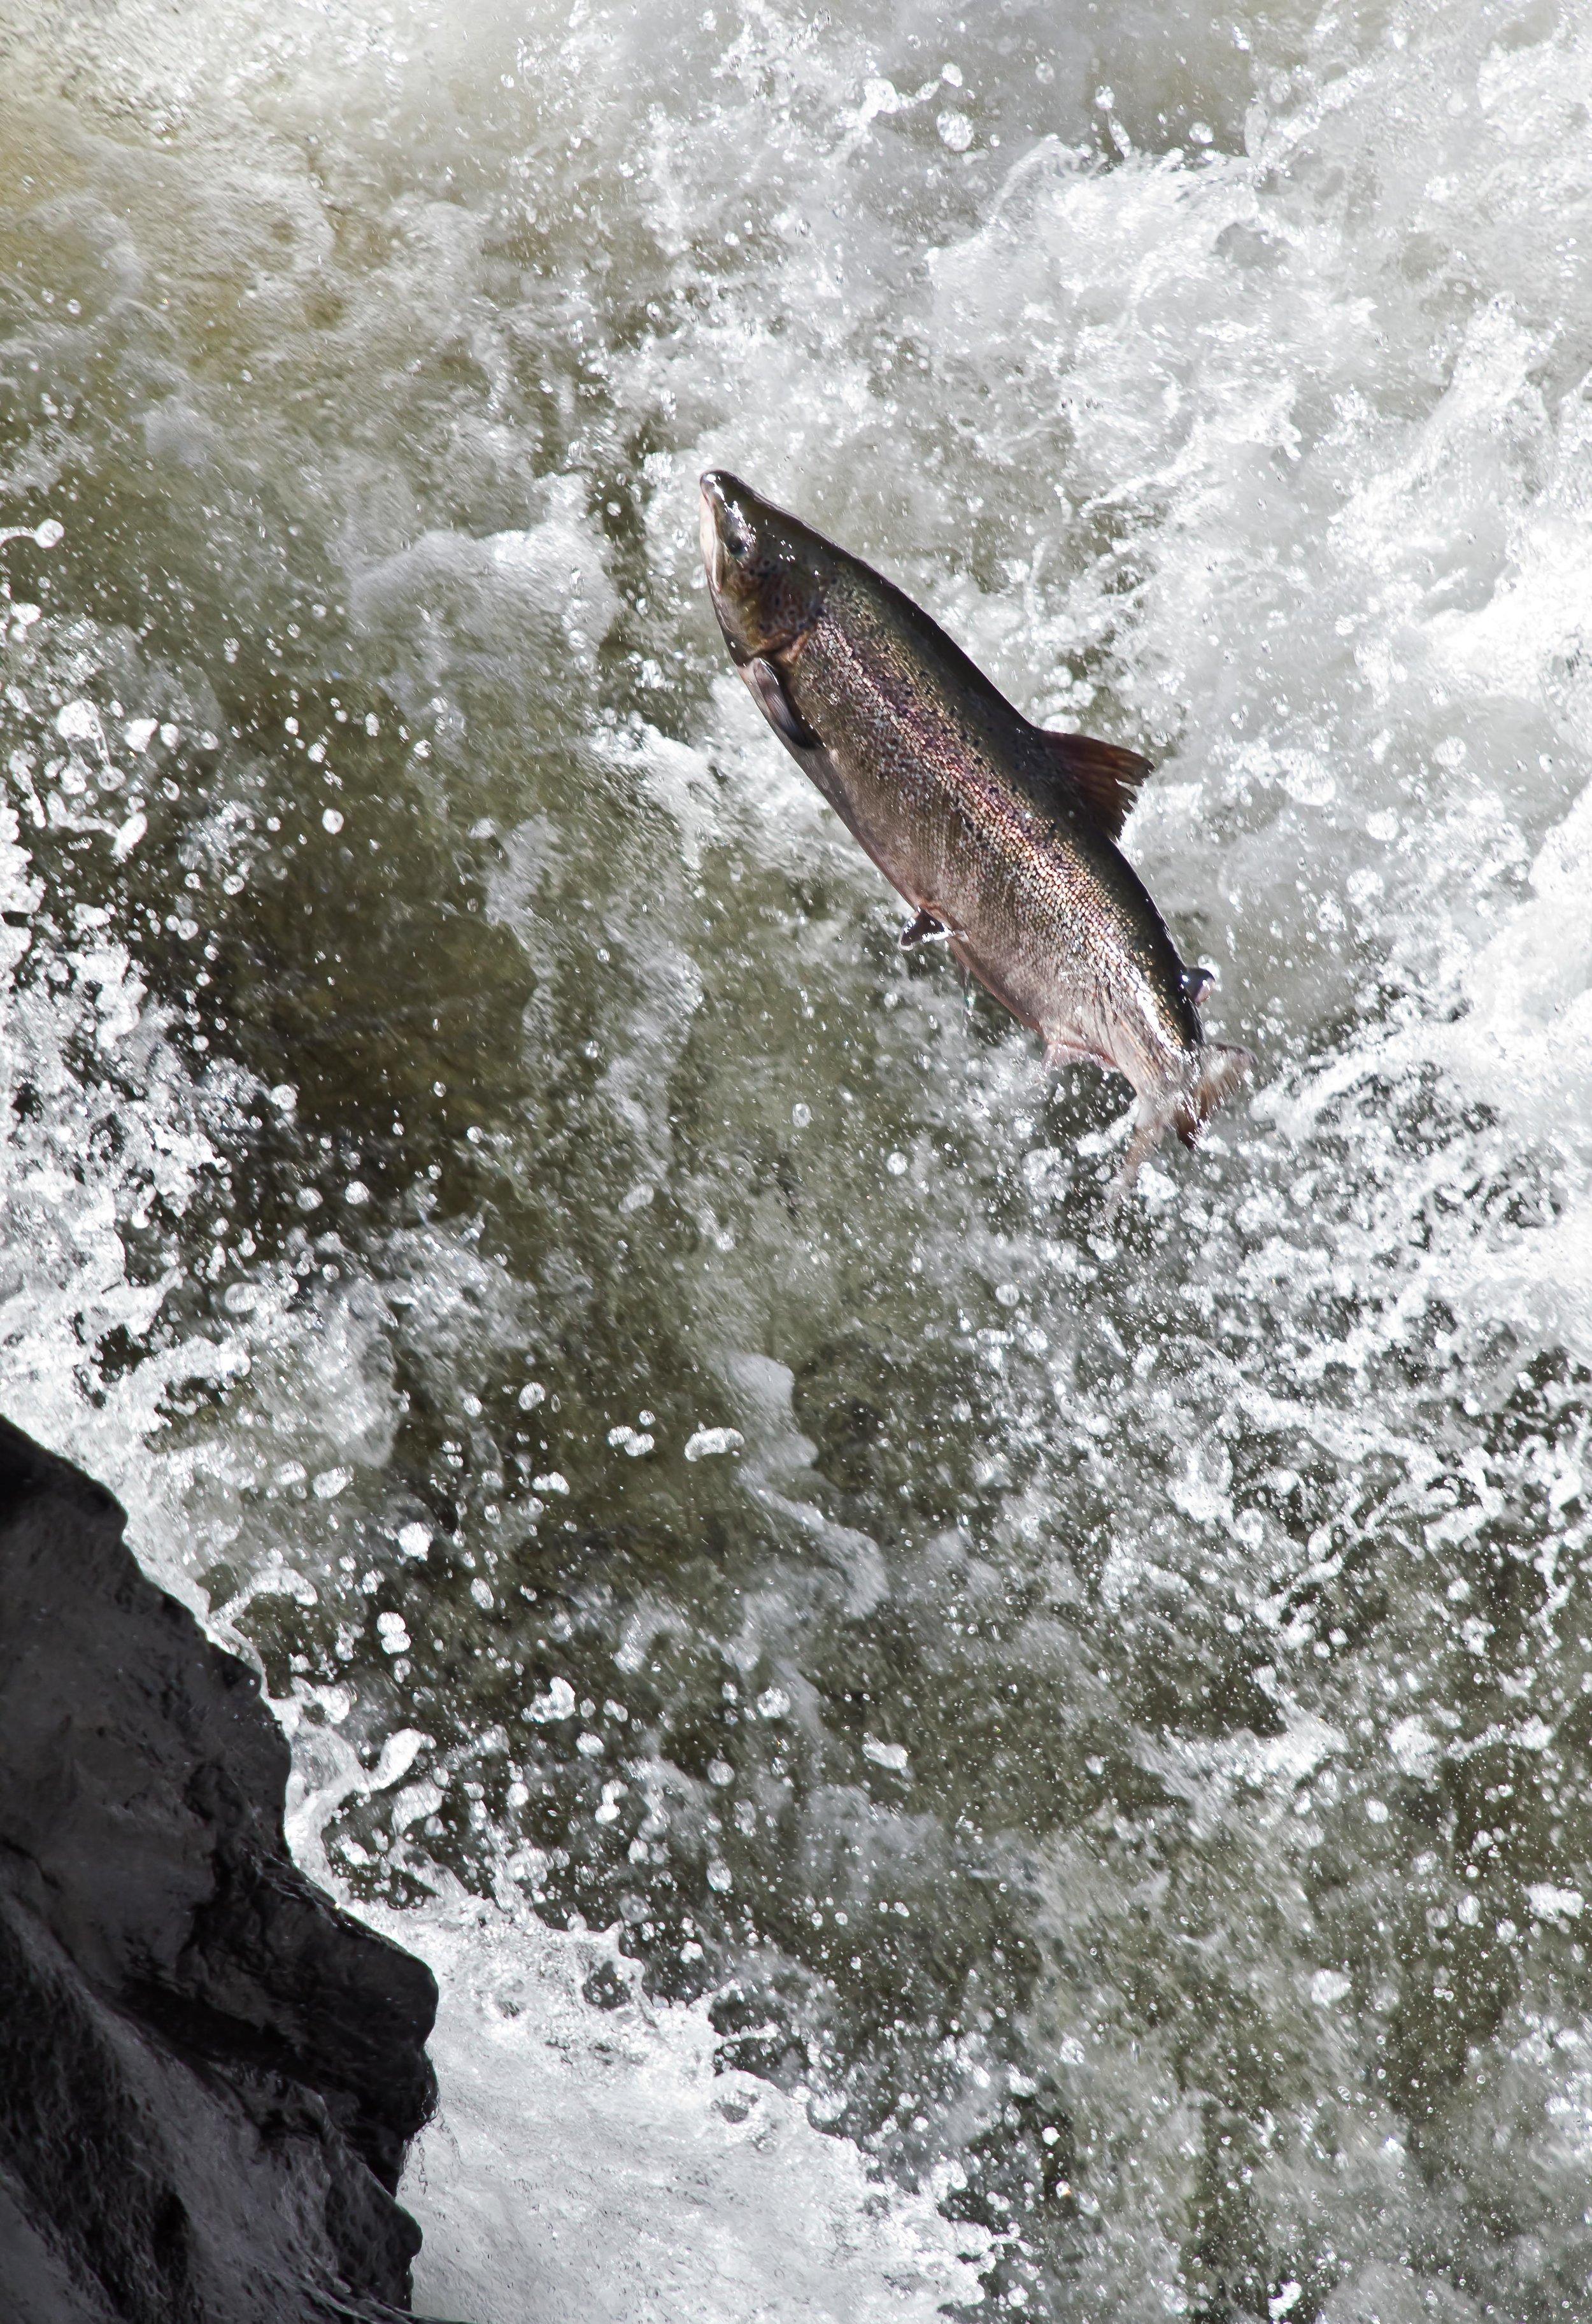 Salmon_leaping_Foto_Matt_Hayes.jpg